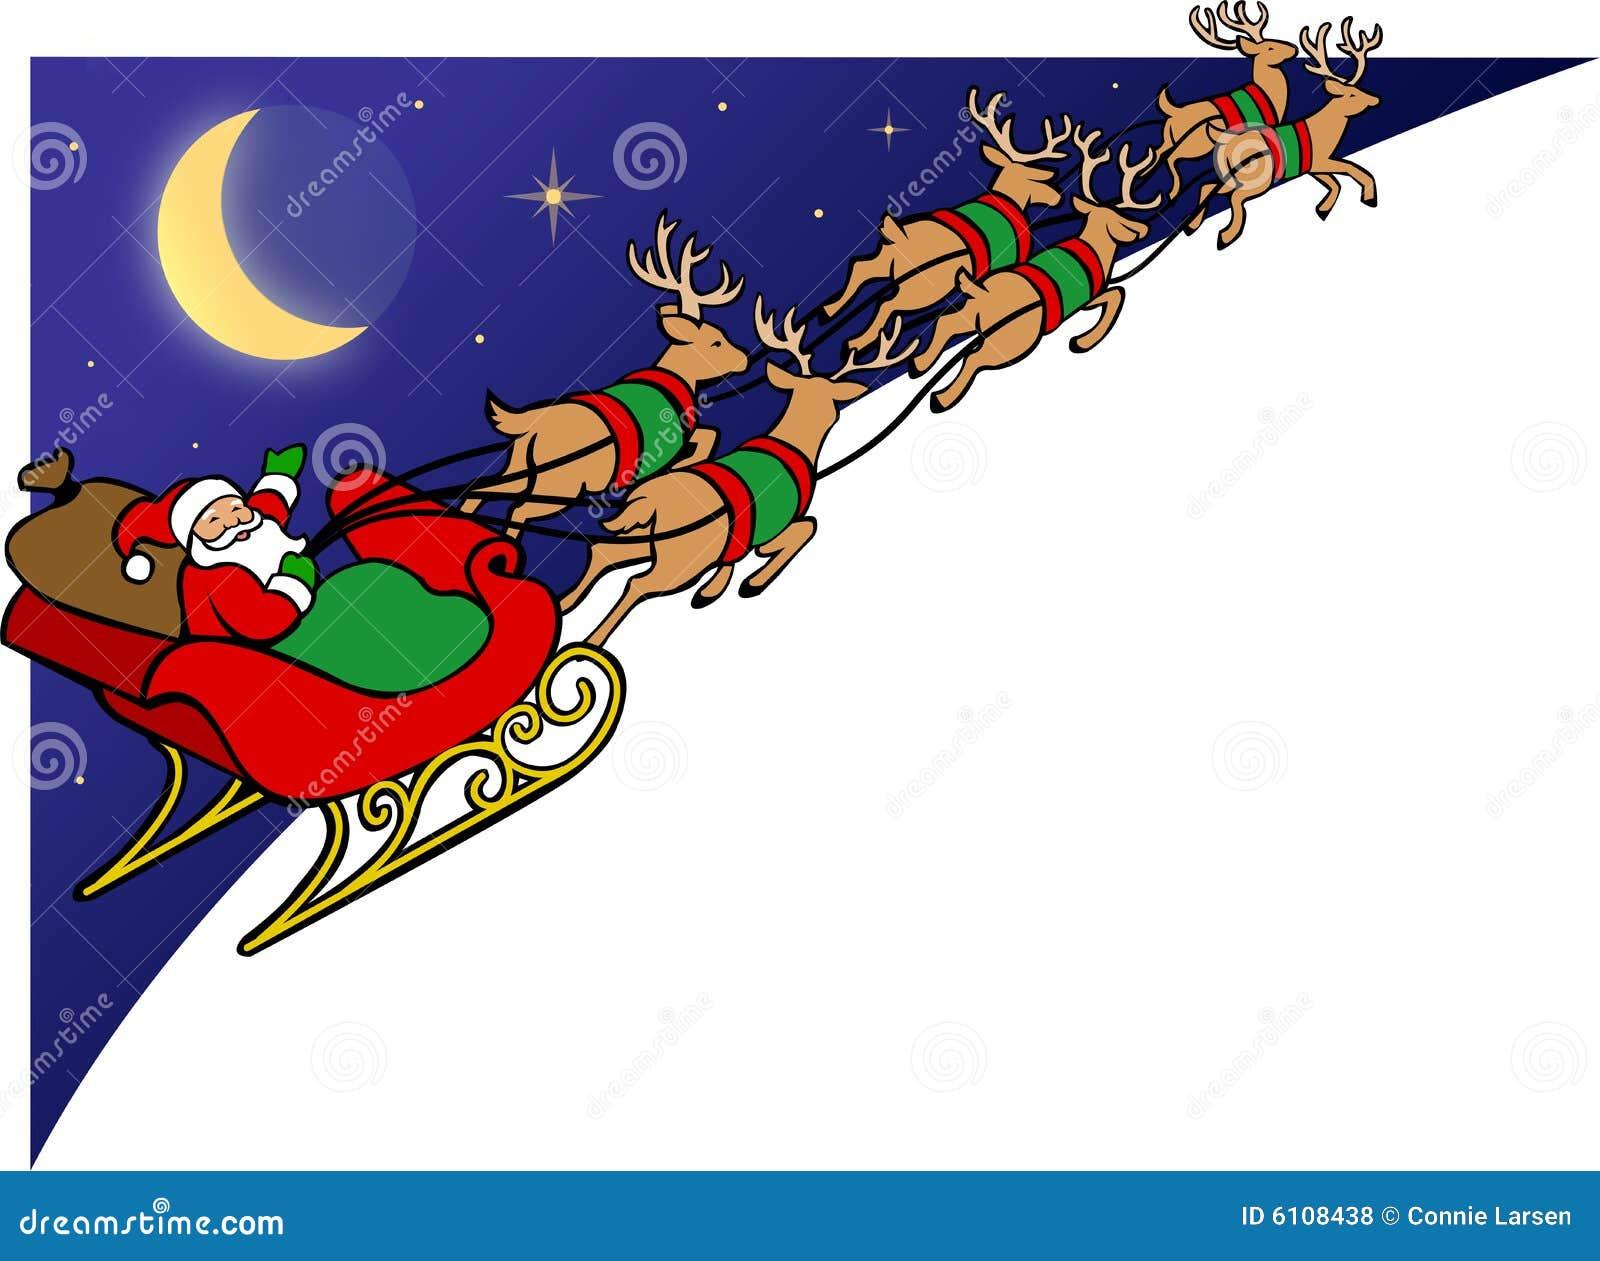 Eps-rensanta sleigh